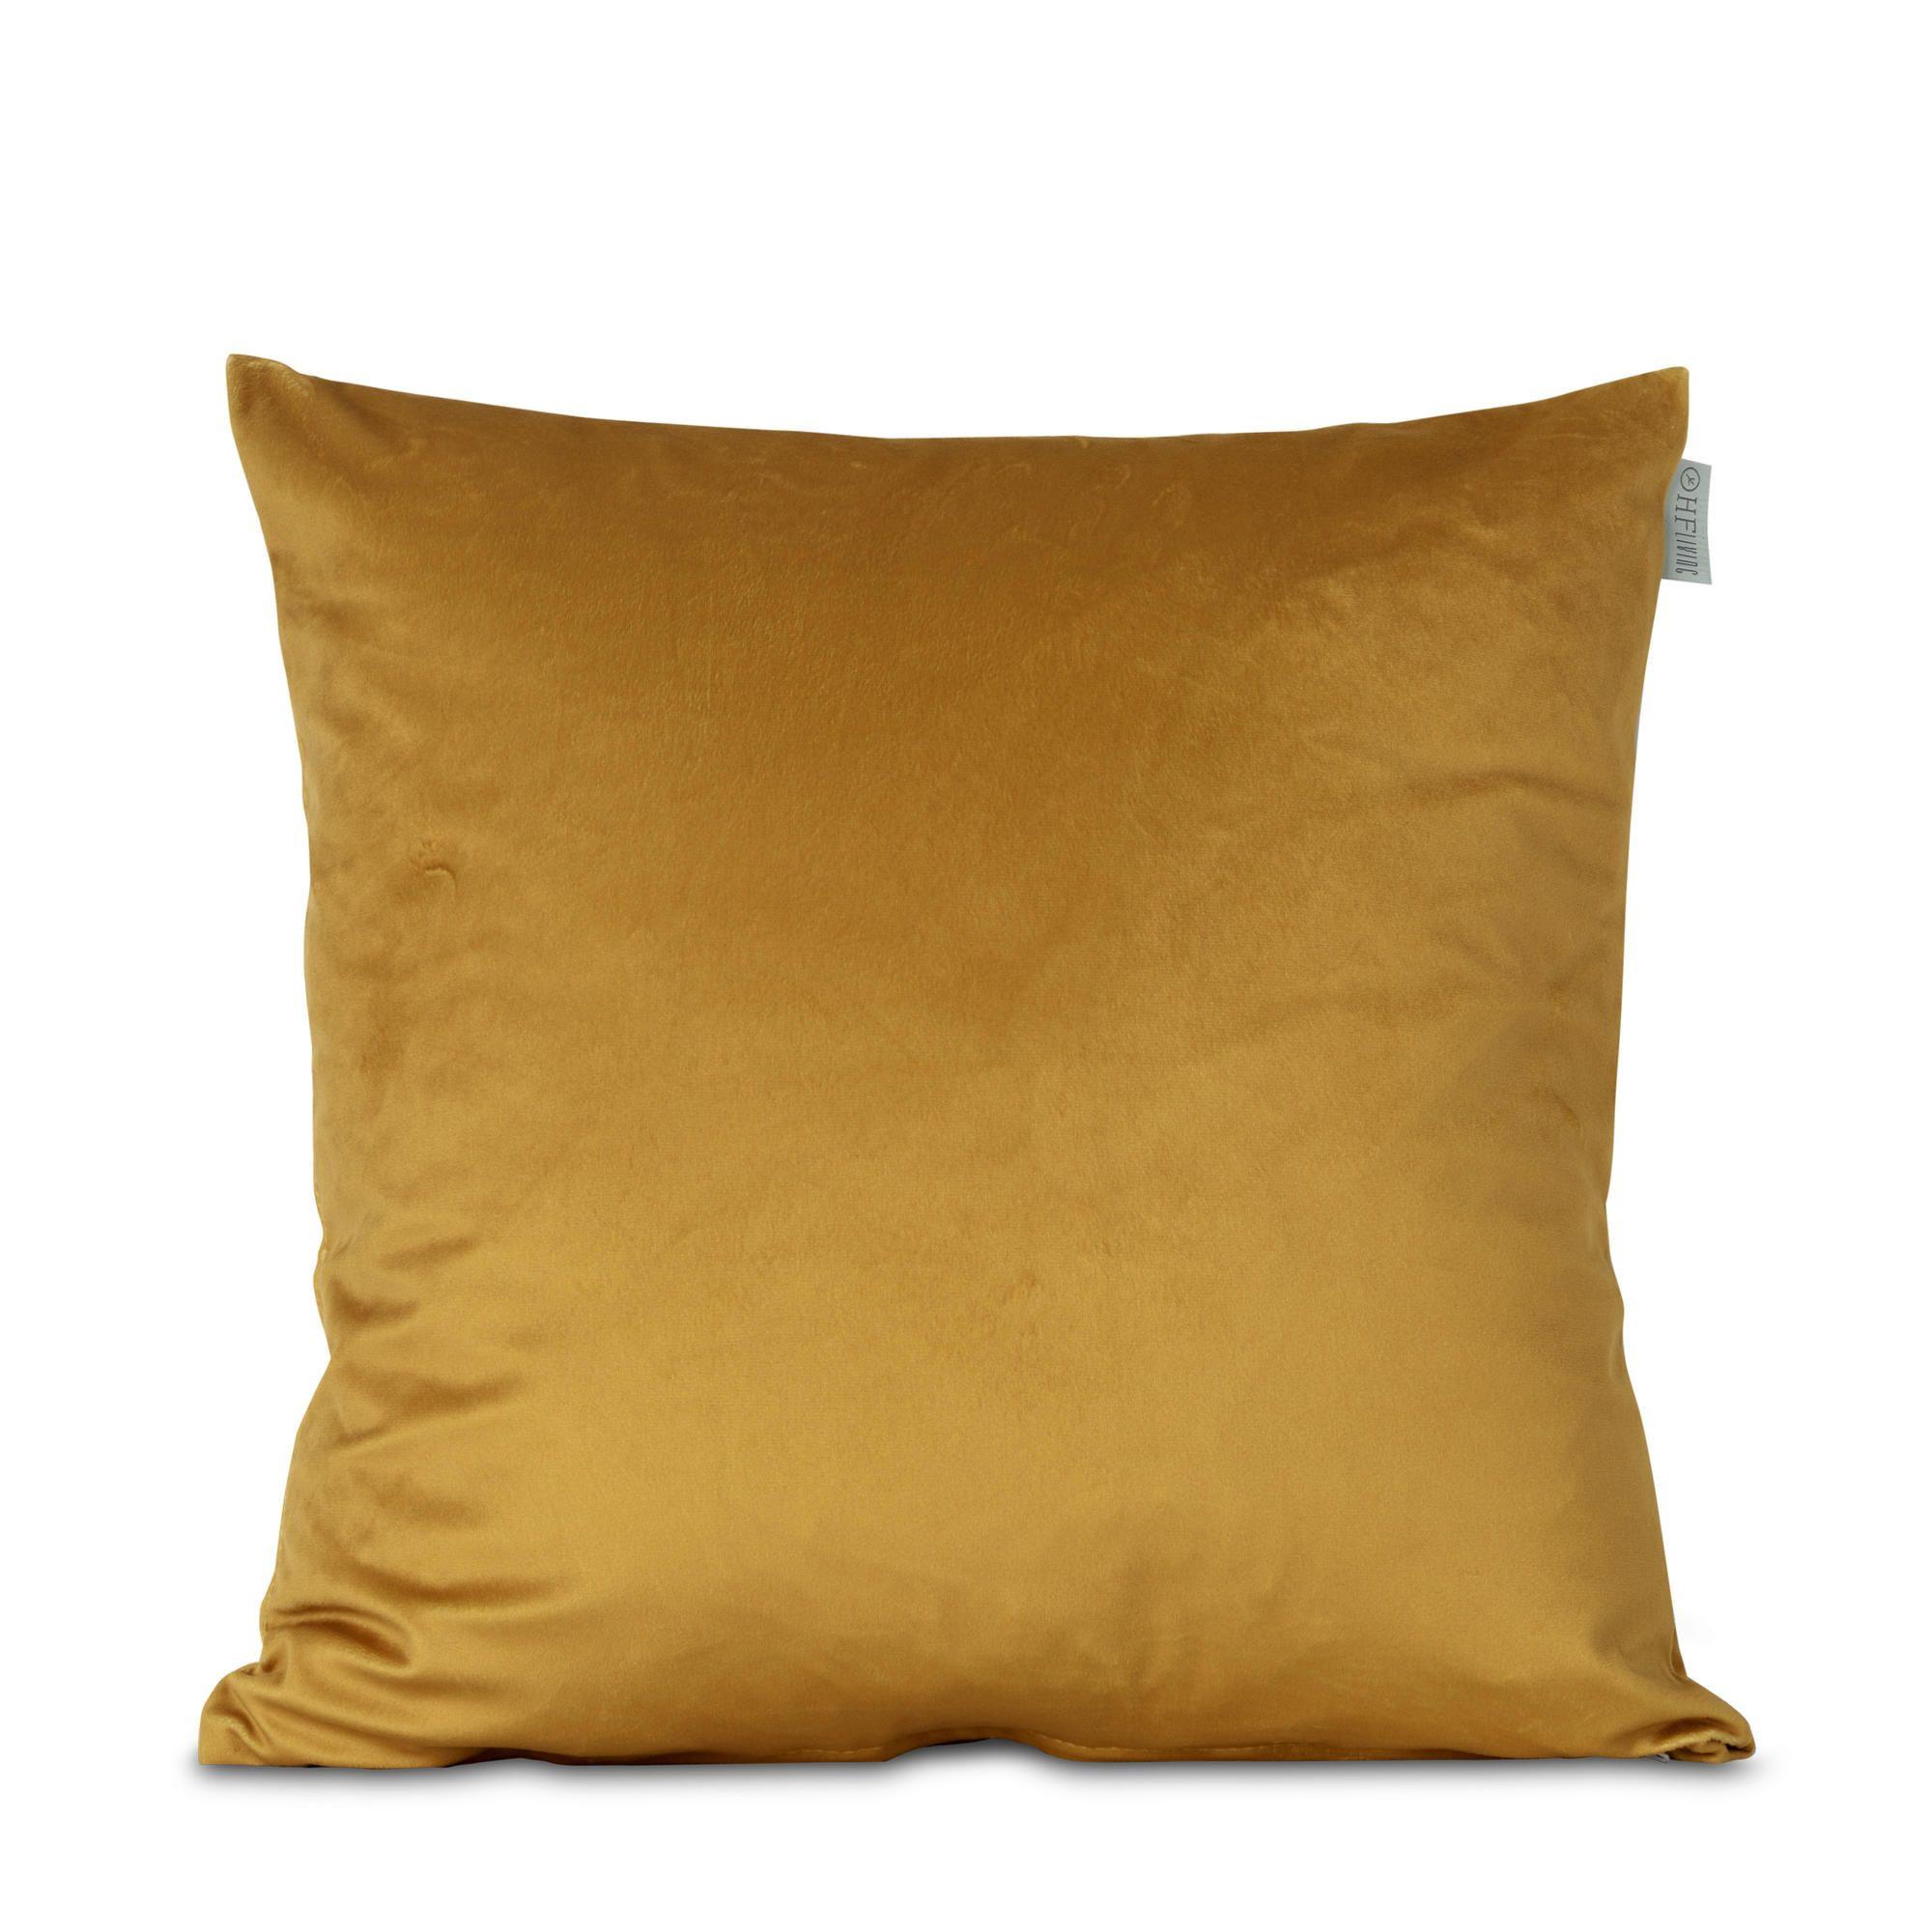 Kussensloop Fluweel Geel | 100% Polyester